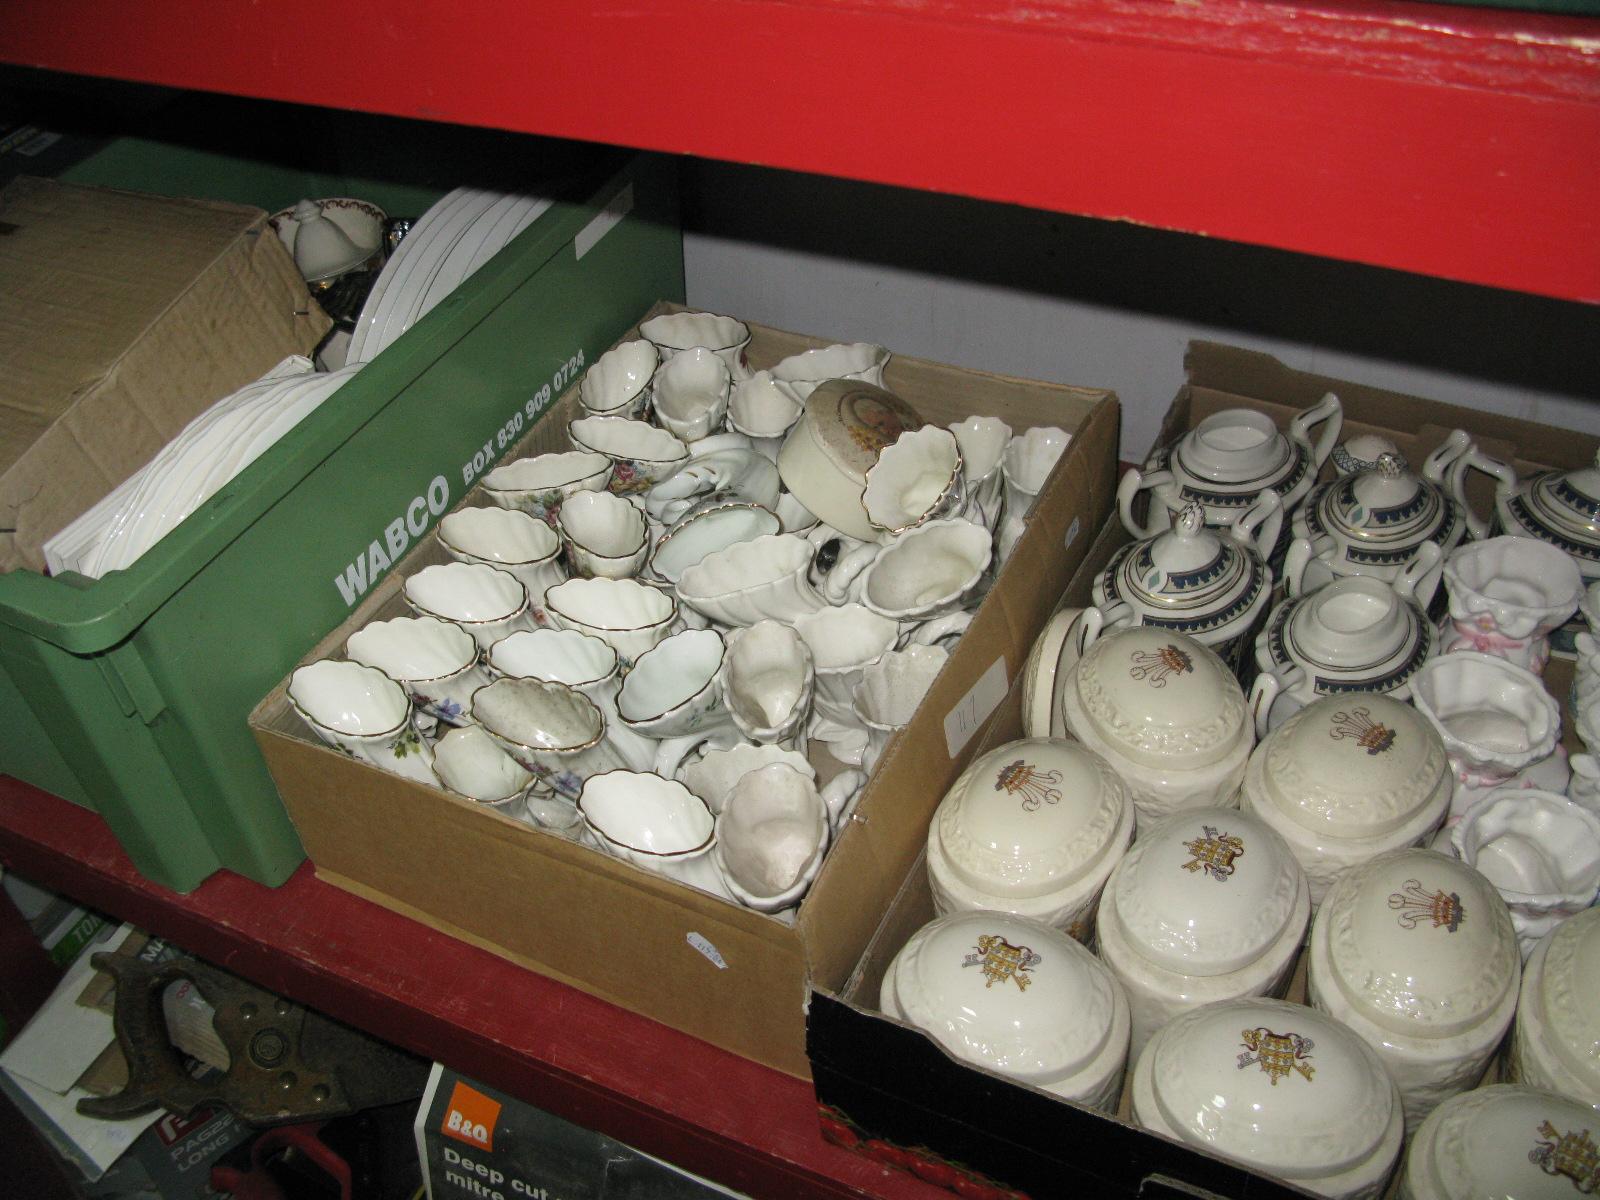 Lot 1060 - A Large Quantity of Mason's Pope Paul Commemorative Wares, Mason's 'Zebak' lidded suqar pots,